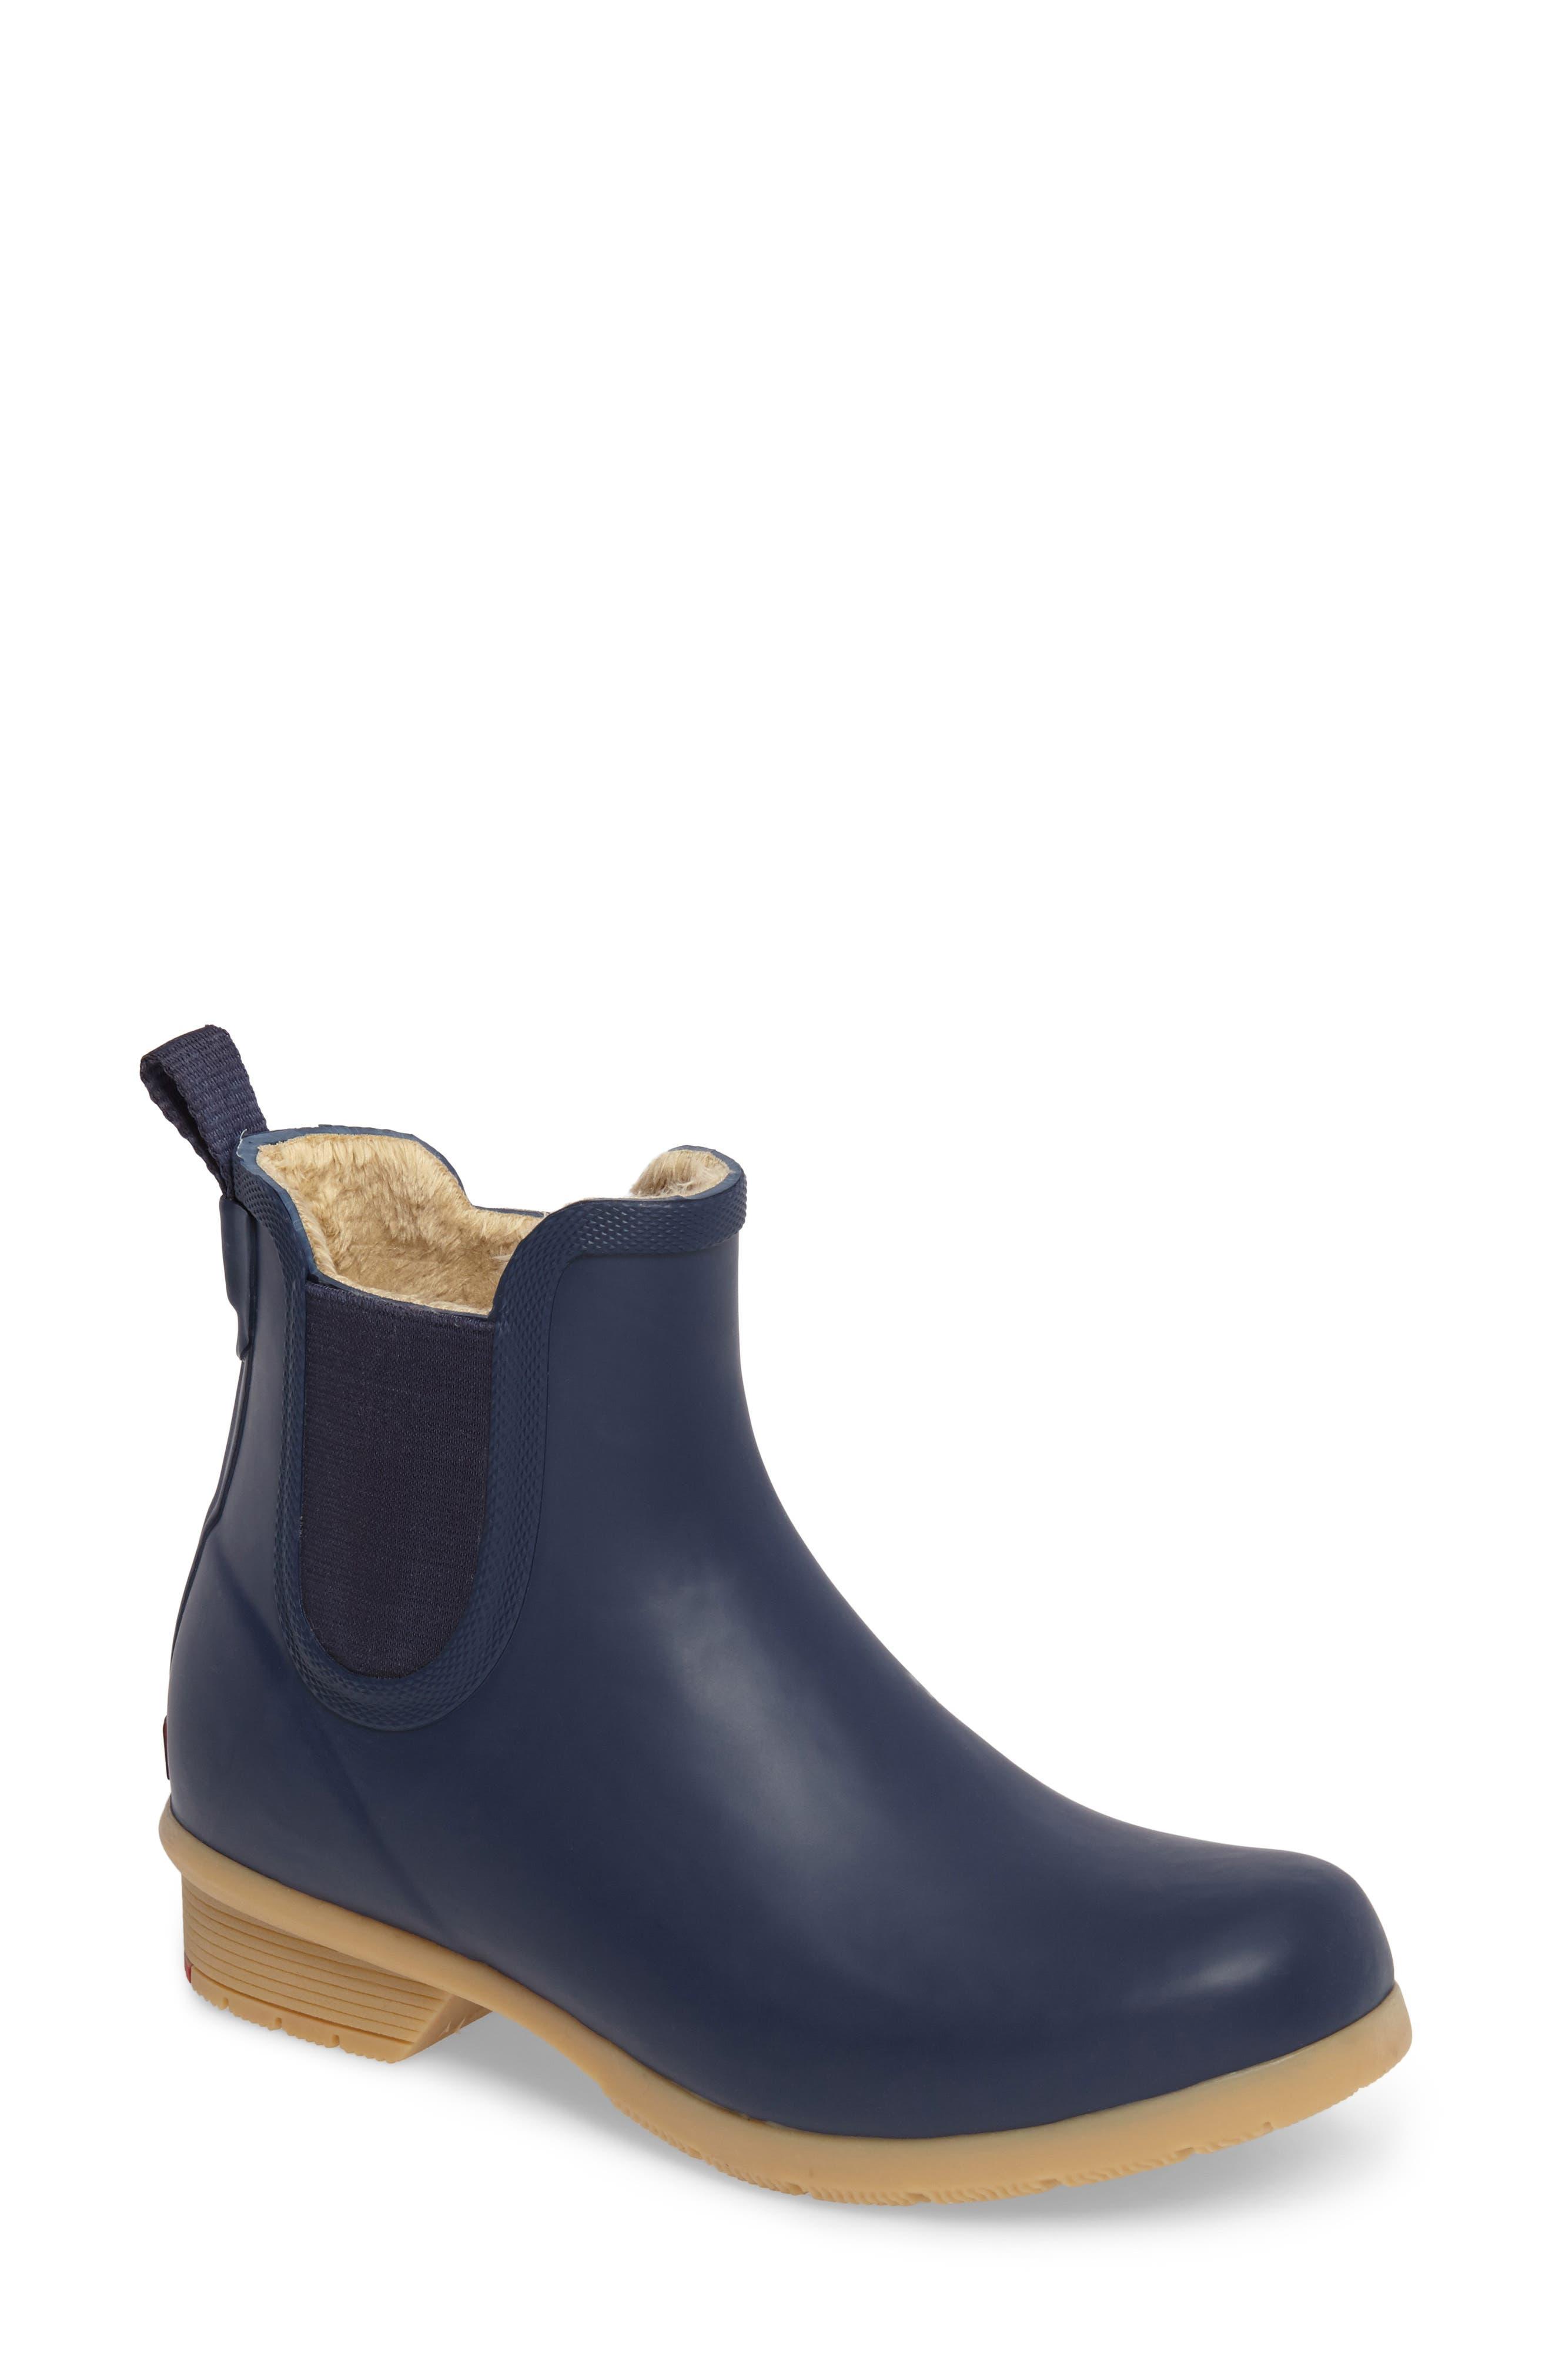 Bainbridge Chelsea Rain Boot,                         Main,                         color, NAVY